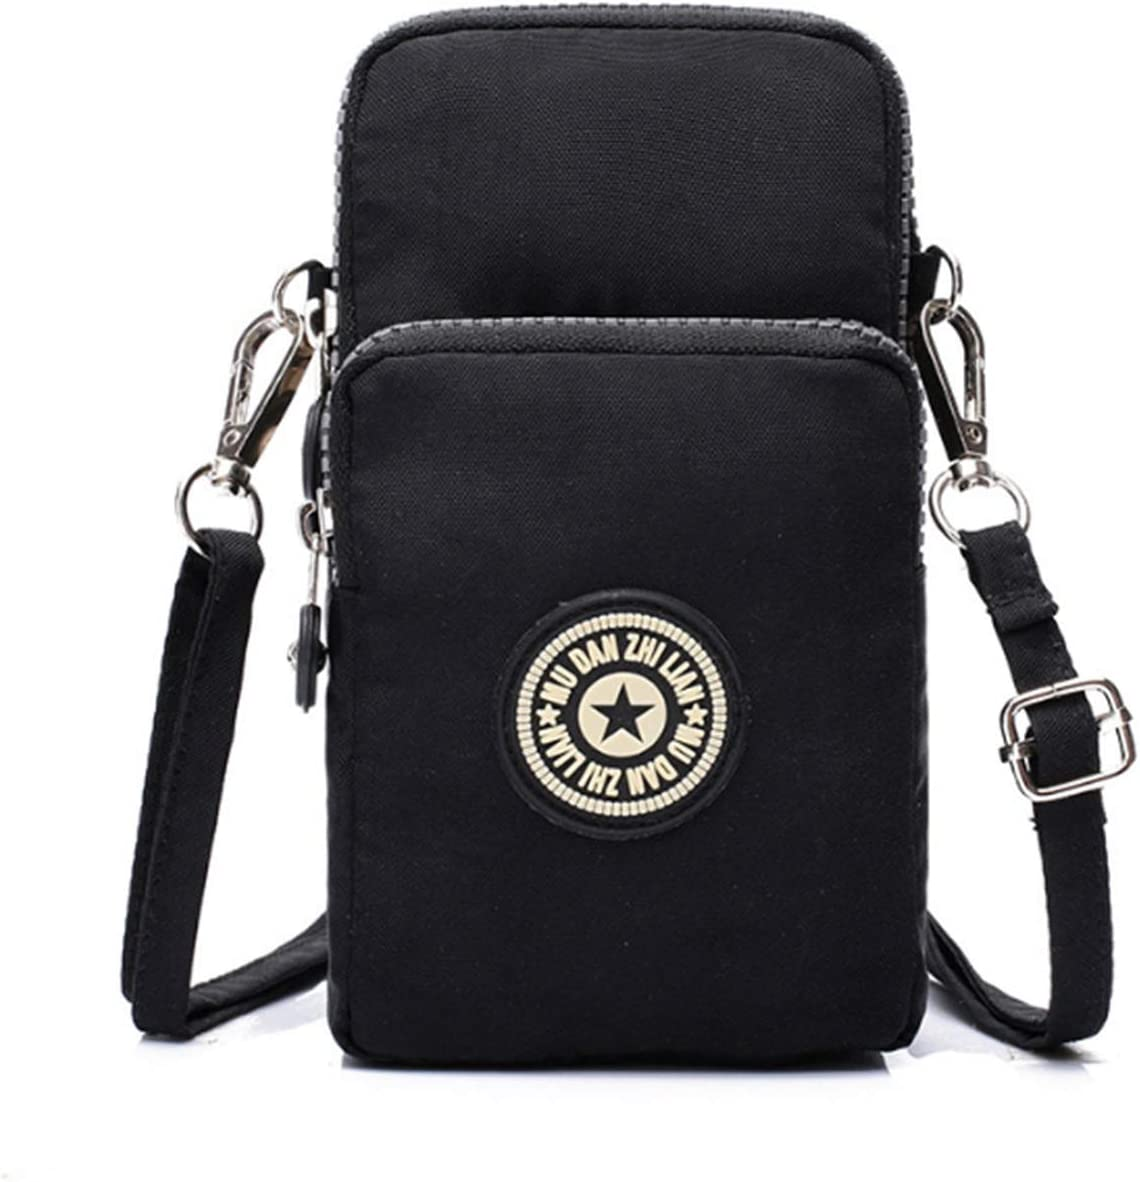 Fashion Sports Shoulder Bag Mini Wrist Purse Armband Bag Universal Phone Holder Pouch Case for iPhone/Samsung/LG/Moto/Black Berry/Sony/HTC/Nexus/Nokia/Lumia/Huawei and So on(Black-2)